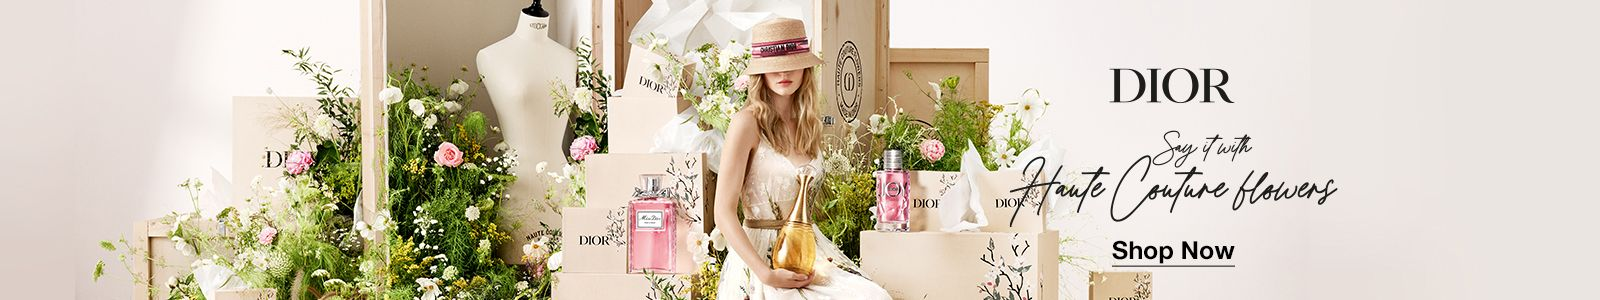 Dior, Shop now